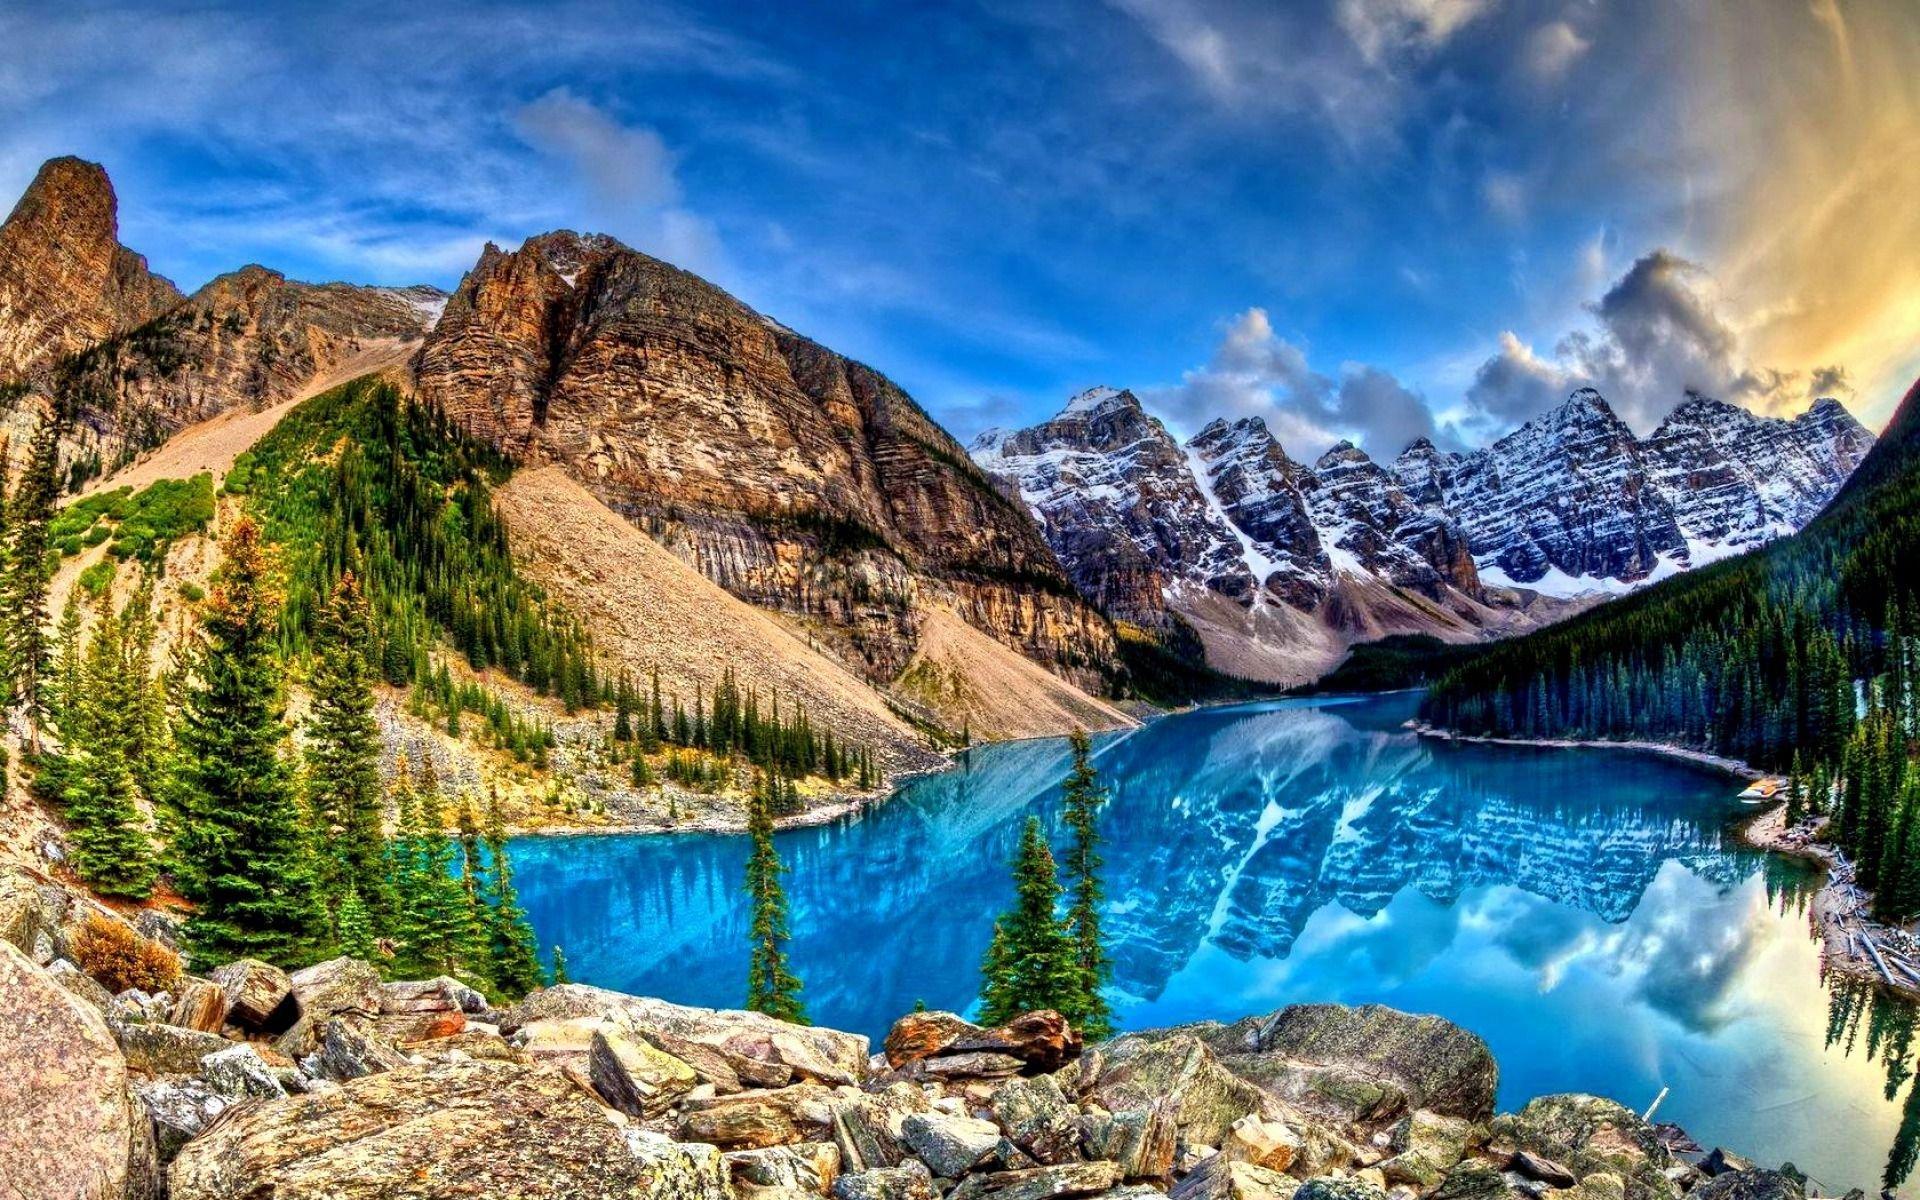 Download Hd 1920x1200 Moraine Lake Desktop Background Id